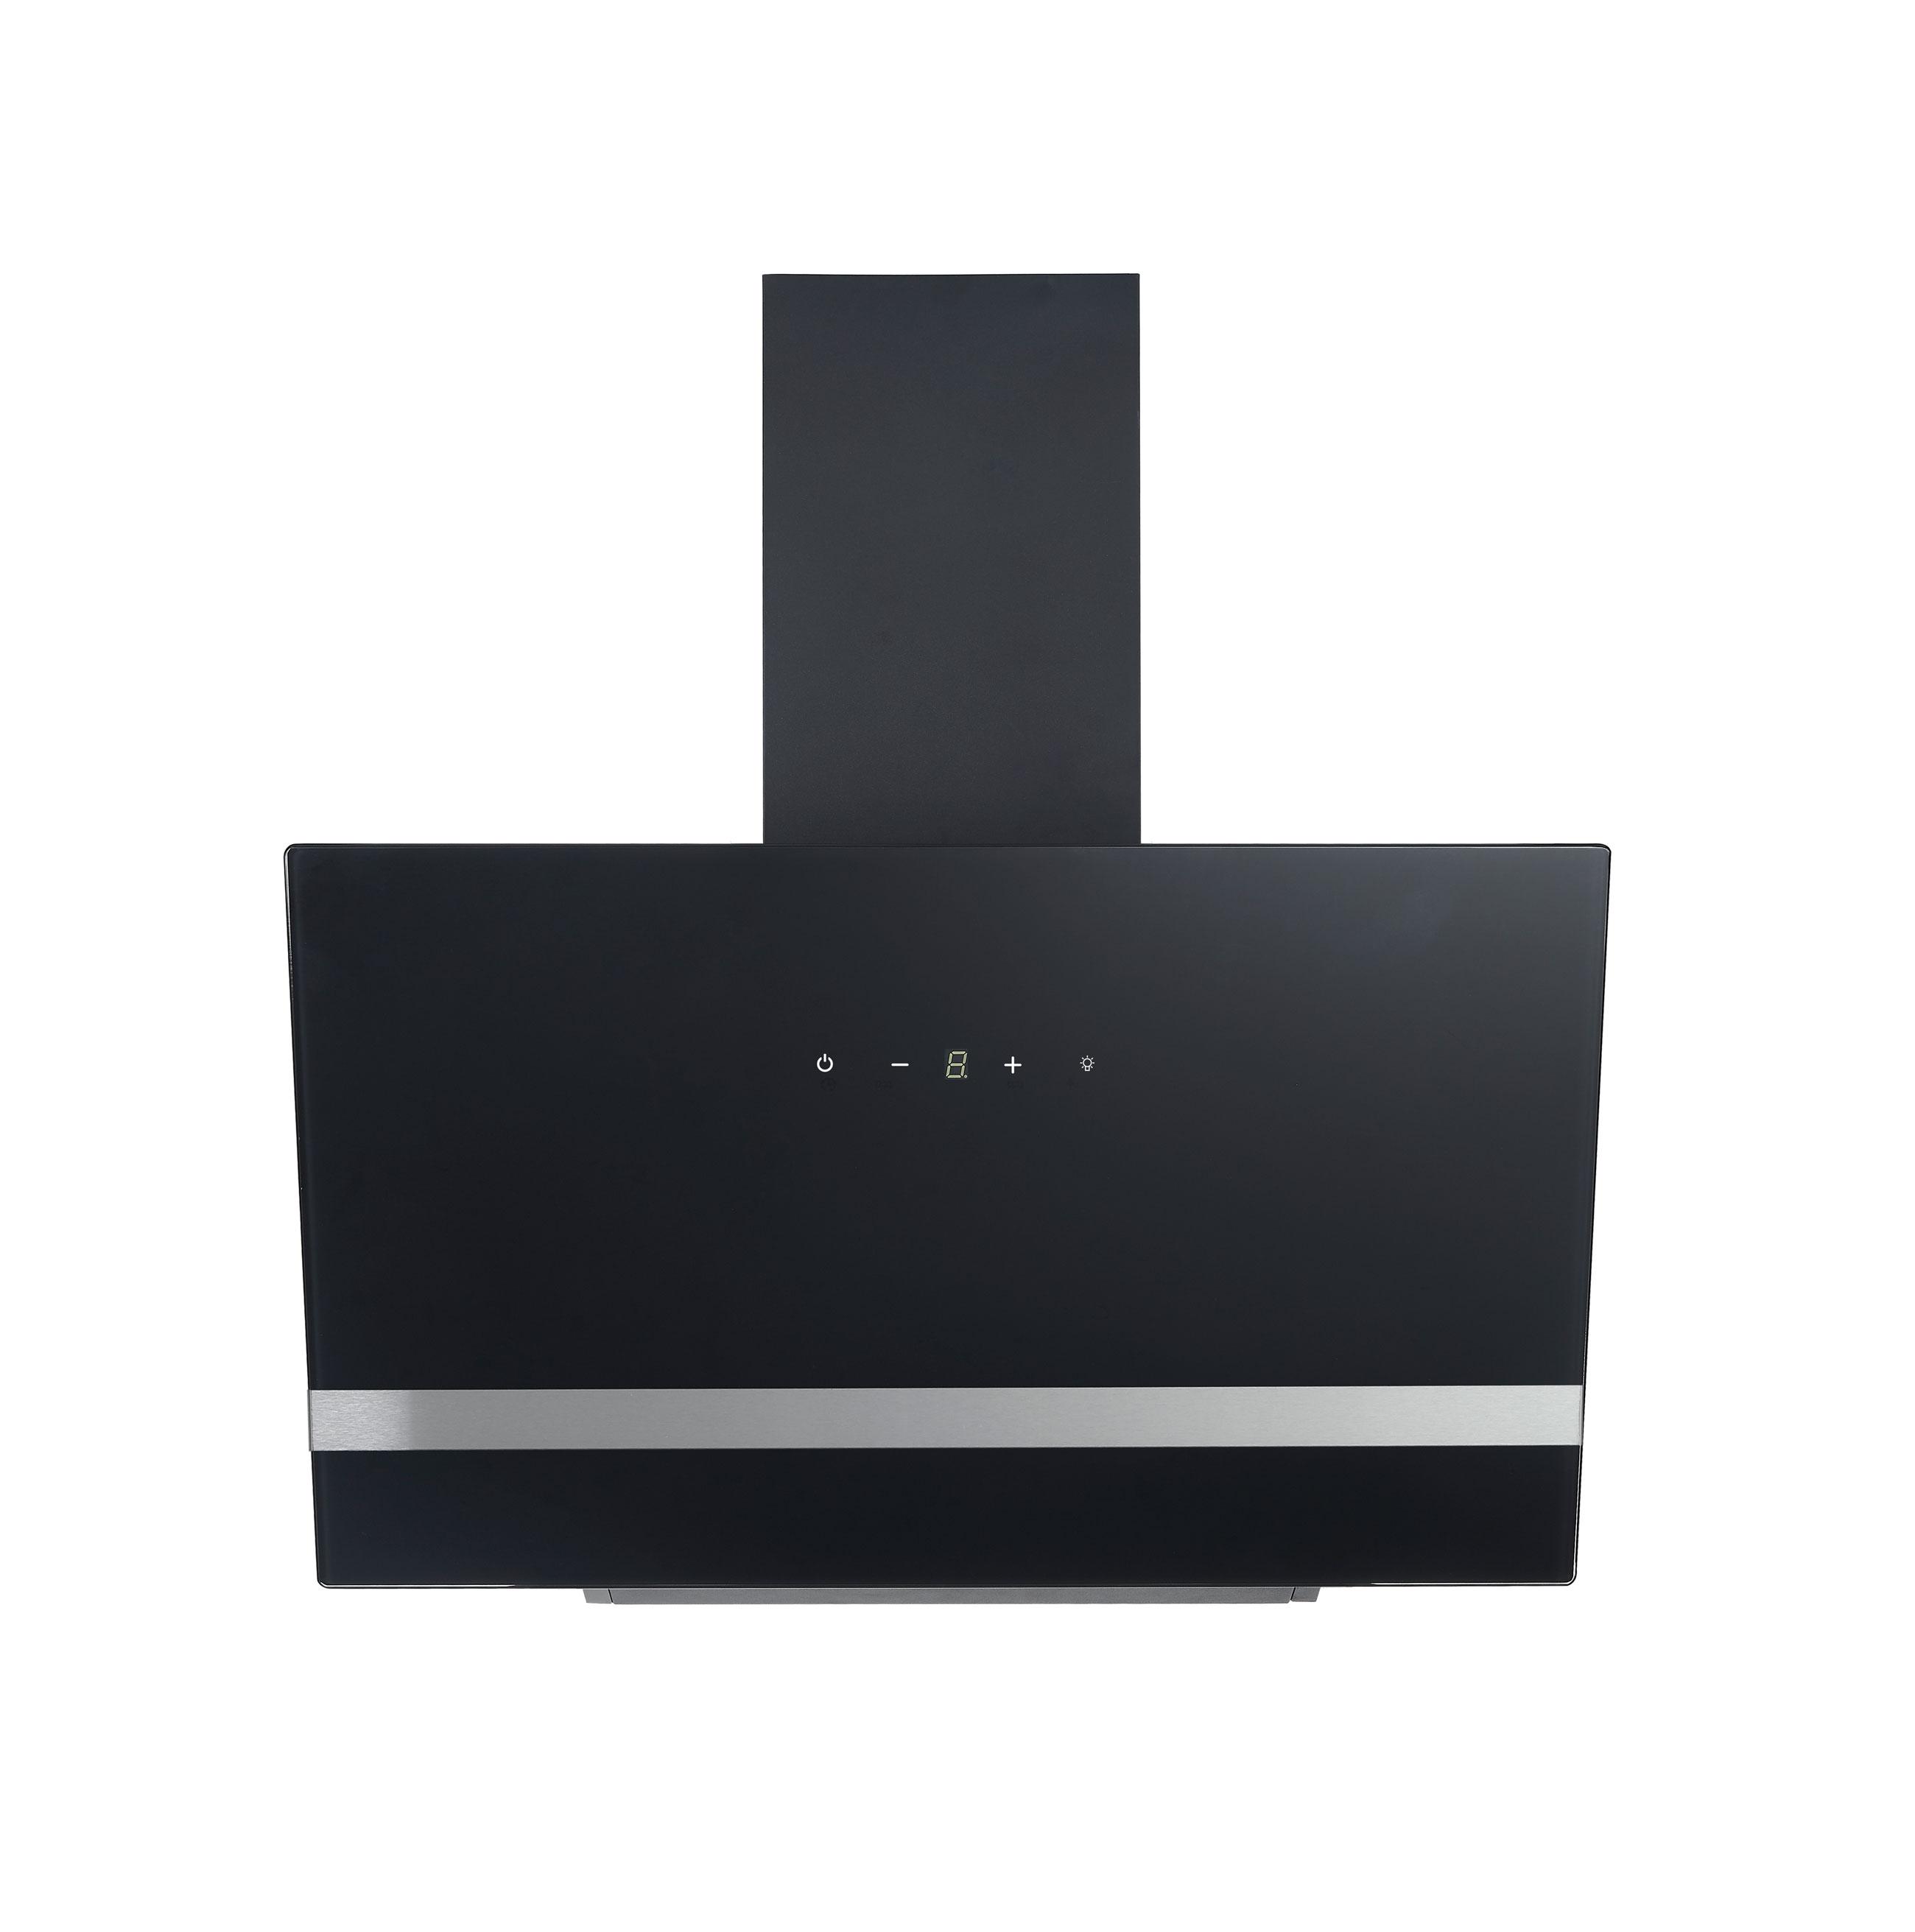 bosch dwb09w652 serie 2 wandhaube 90 cm hohe l fterleistung edelstahl. Black Bedroom Furniture Sets. Home Design Ideas